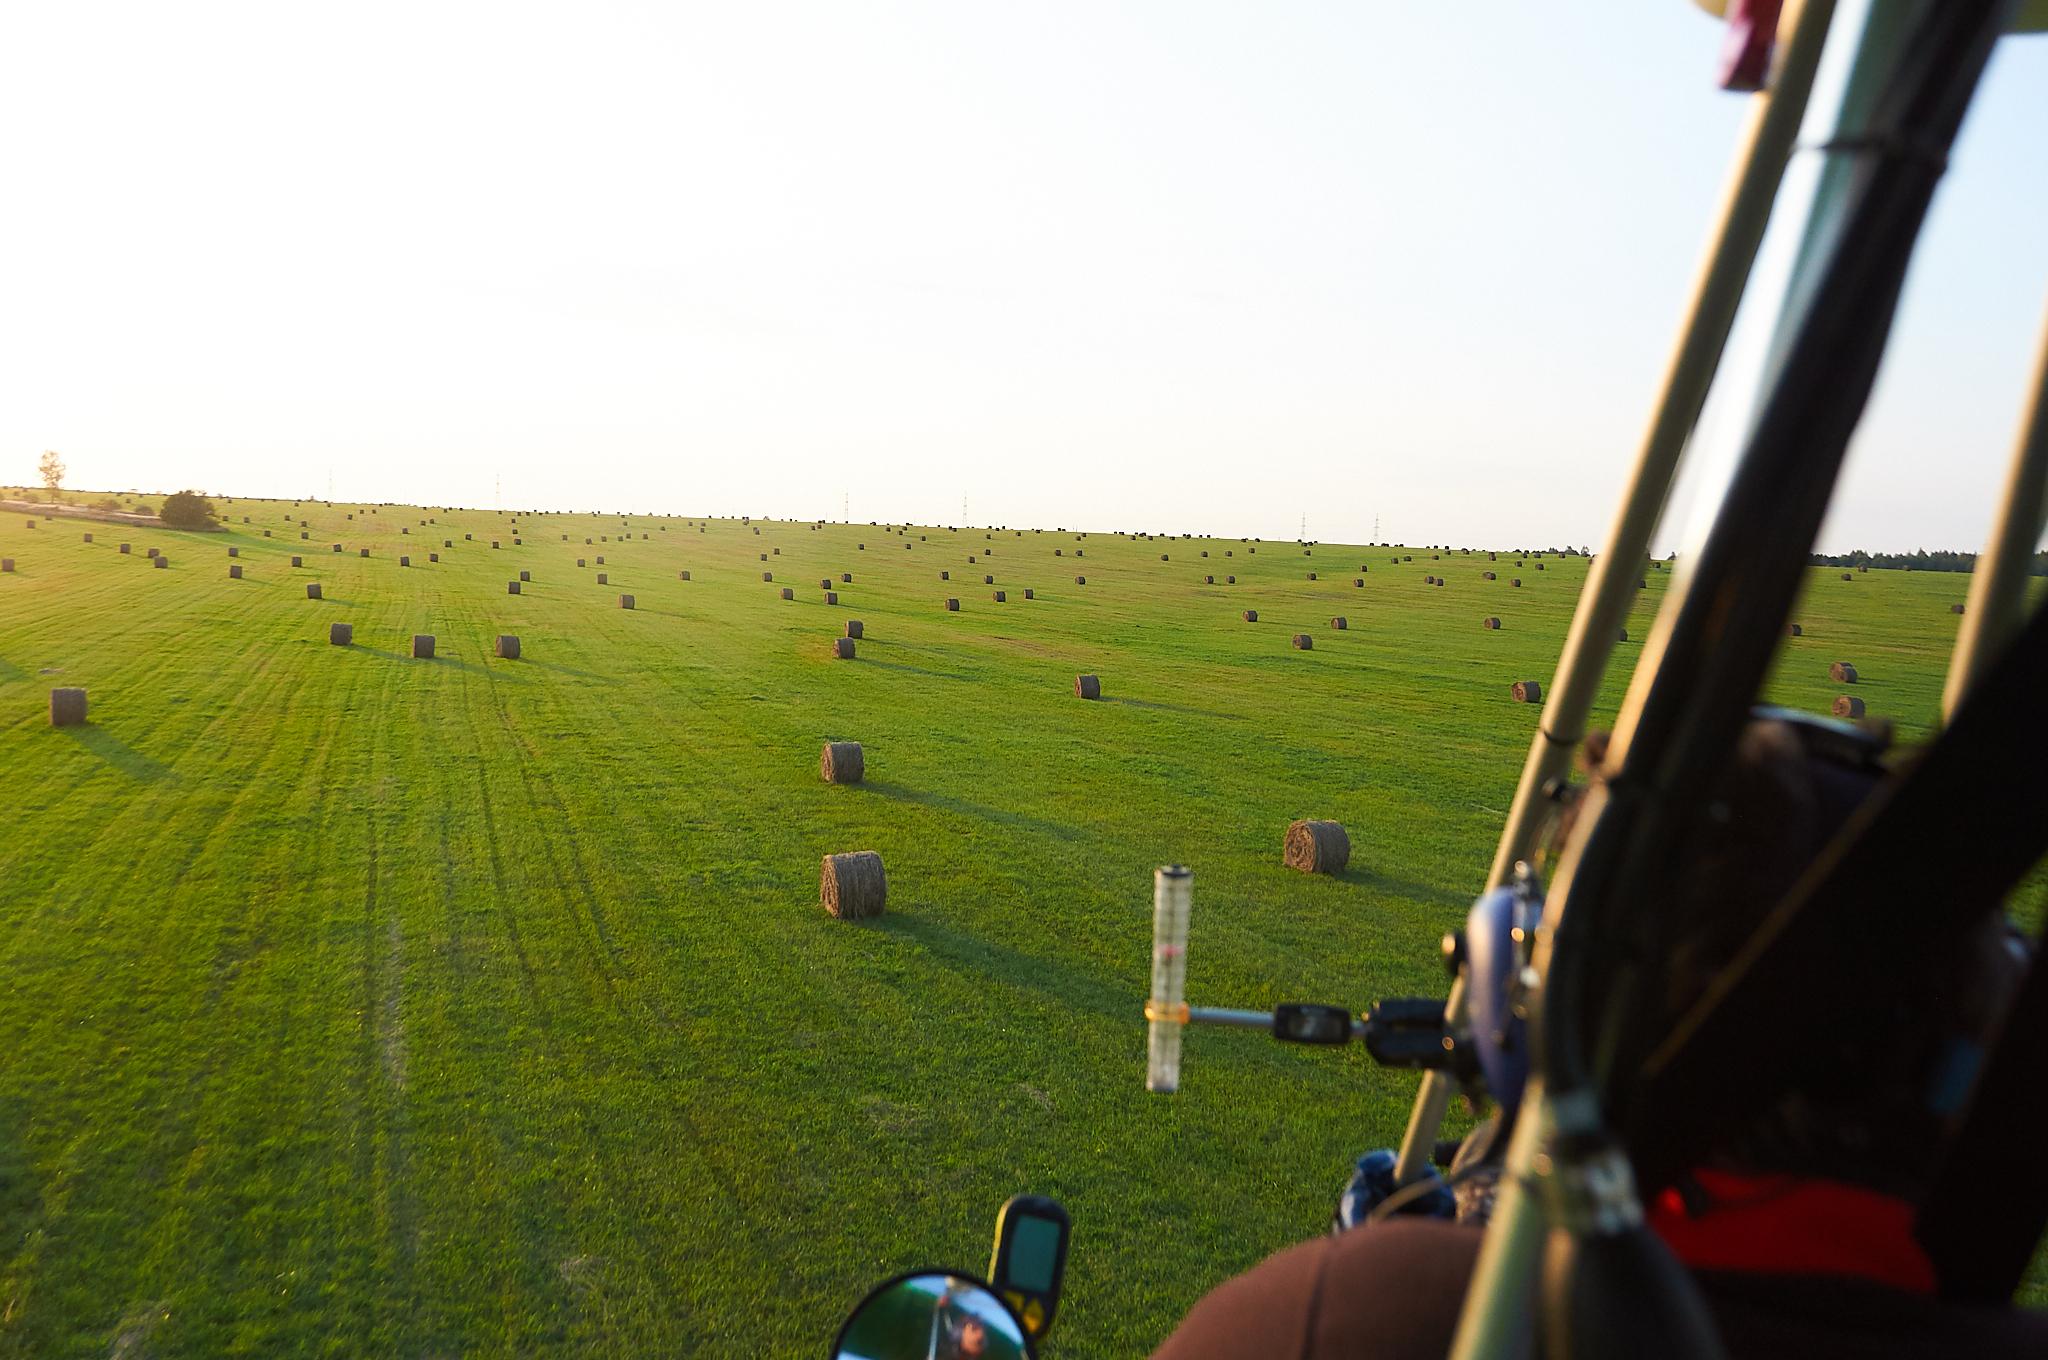 Round hay bales - Катышки? Рулончики?